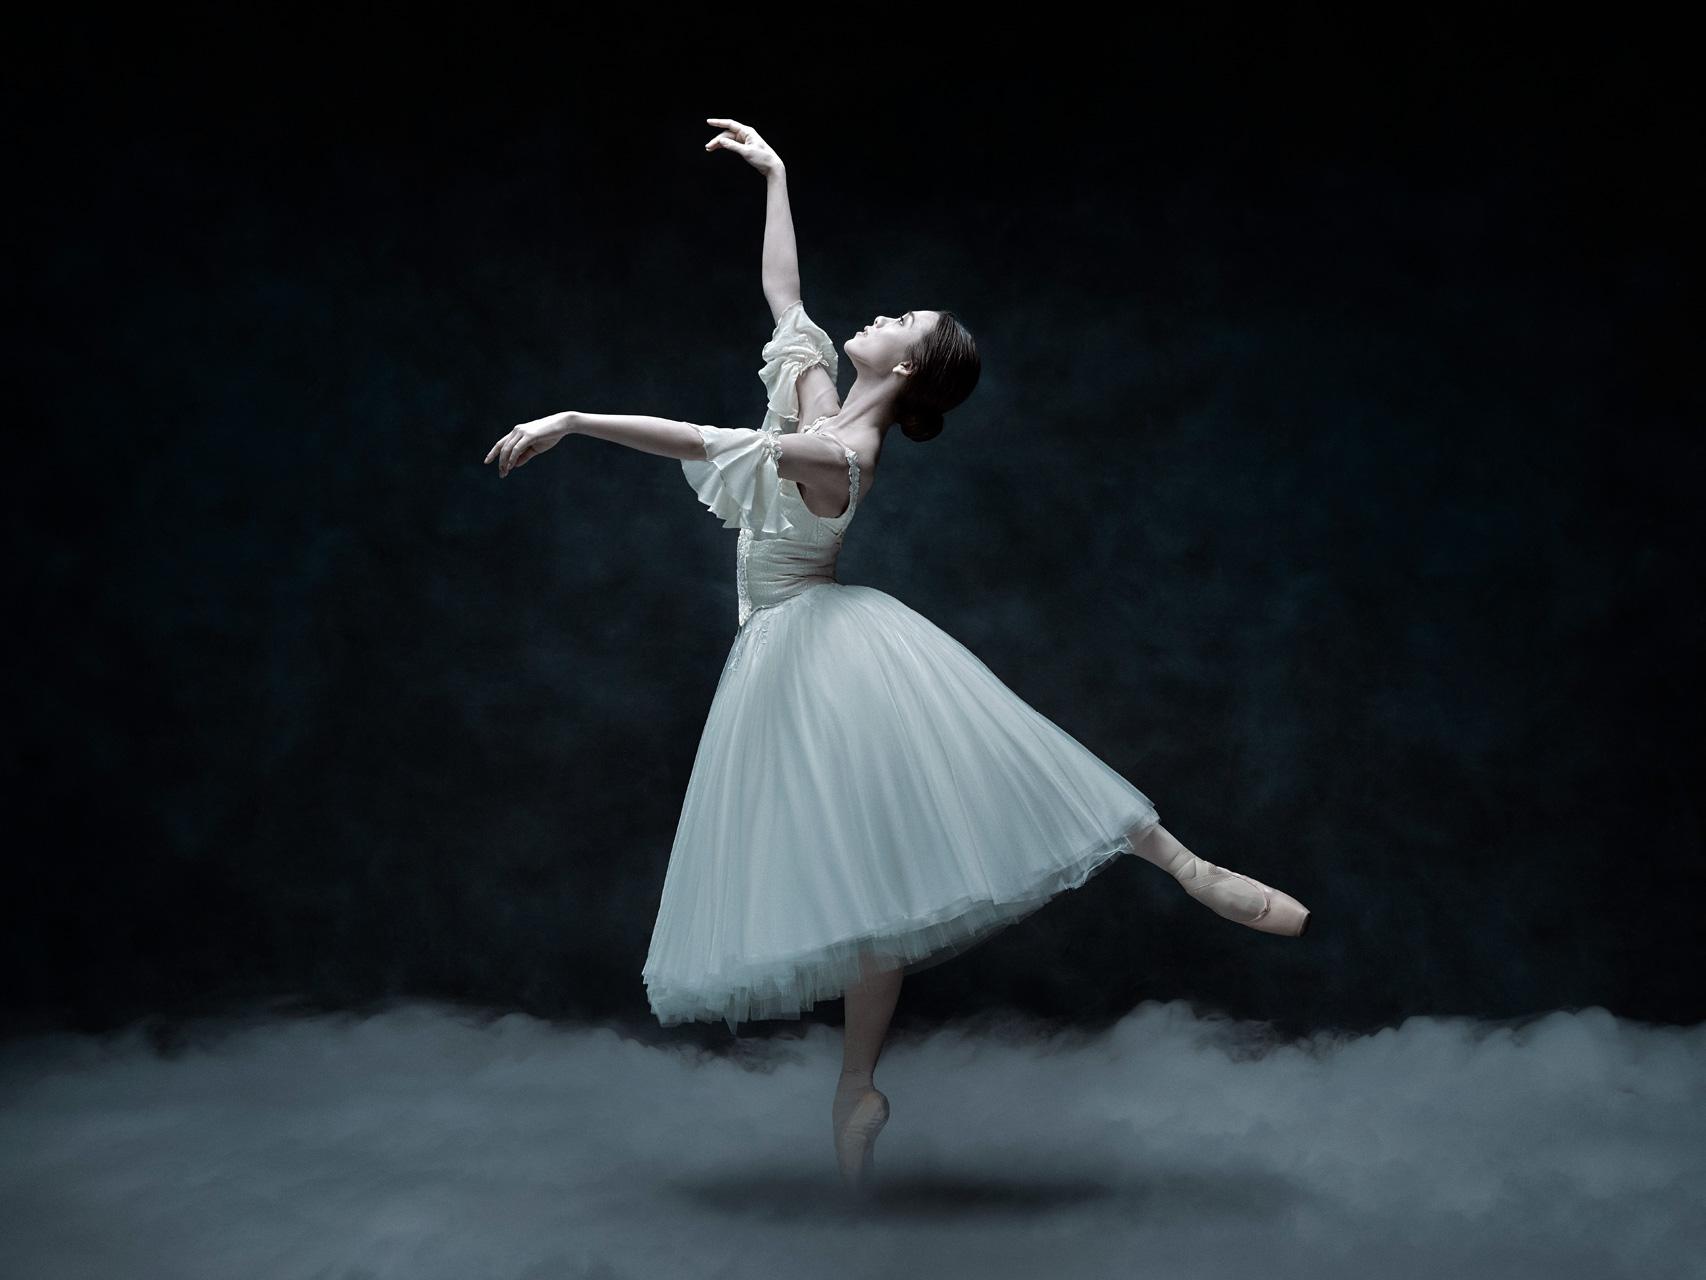 Dancer: Yui Sugawara / Les Grands Ballets de Montreal